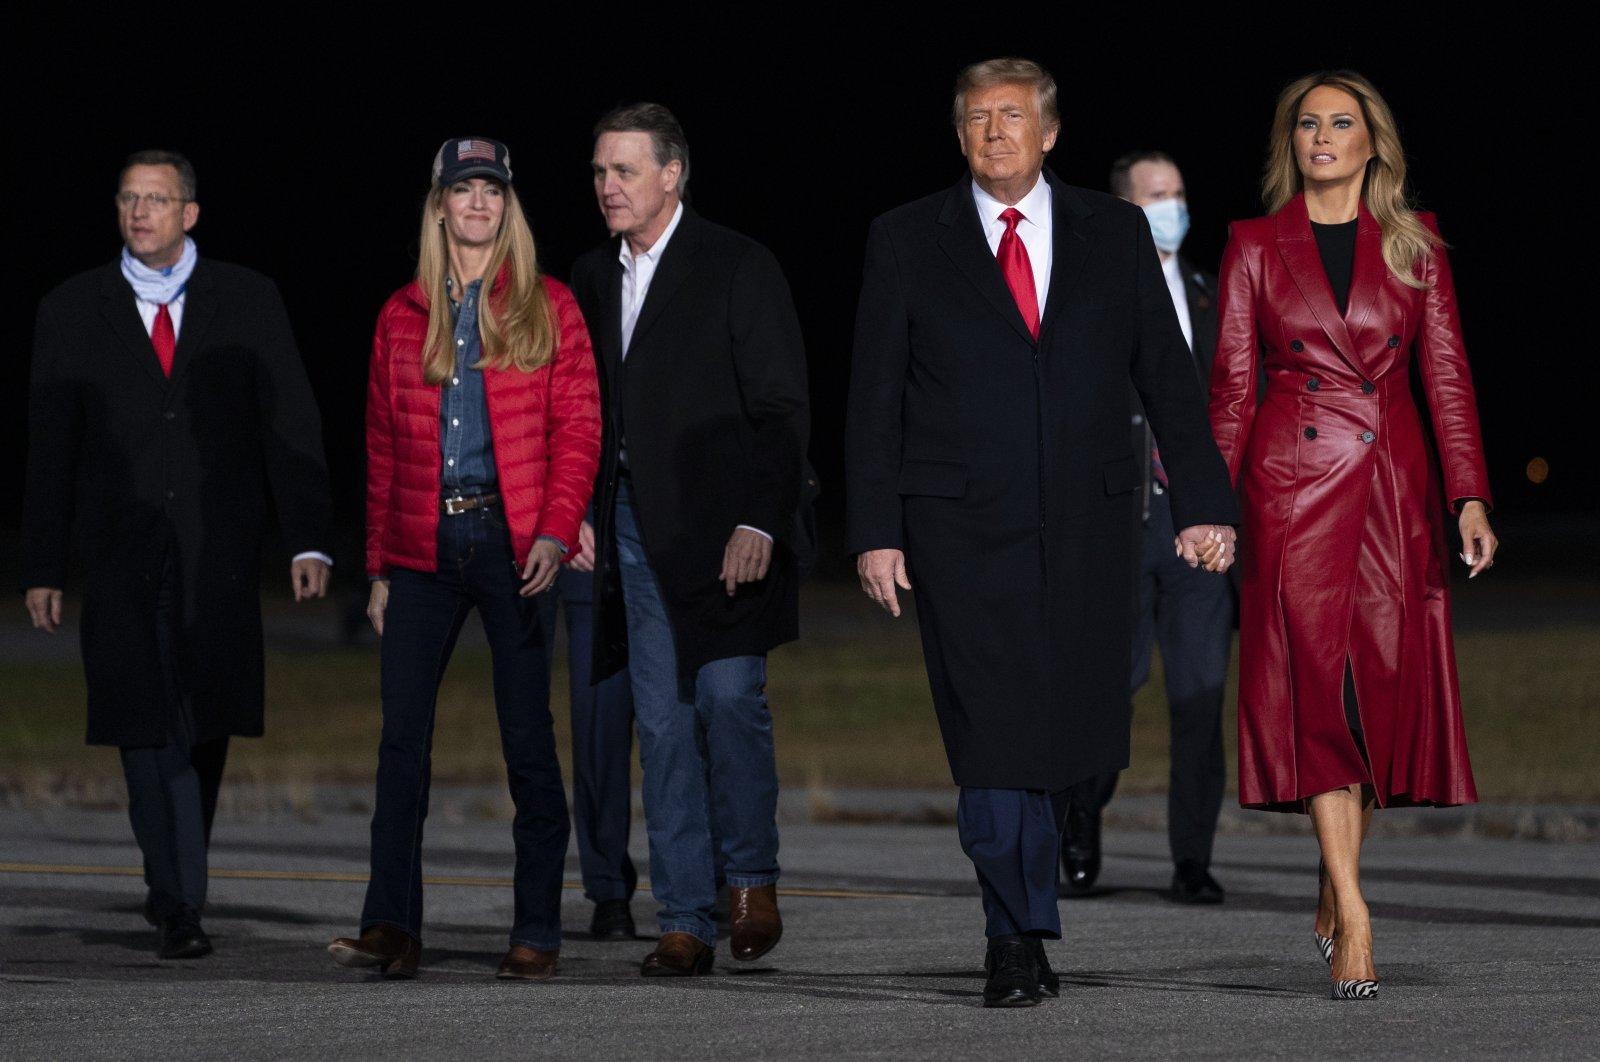 U.S. President Donald Trump and first lady Melania Trump (R) arrive with Sen. Kelly Loeffler, R-Ga., (L) and Sen. David Perdue, R-Ga., (C) to a campaign rally for Senate Republican candidates, at Valdosta Regional Airport, in Valdosta, Georgia, U.S., Dec. 5, 2020. (AP Photo)